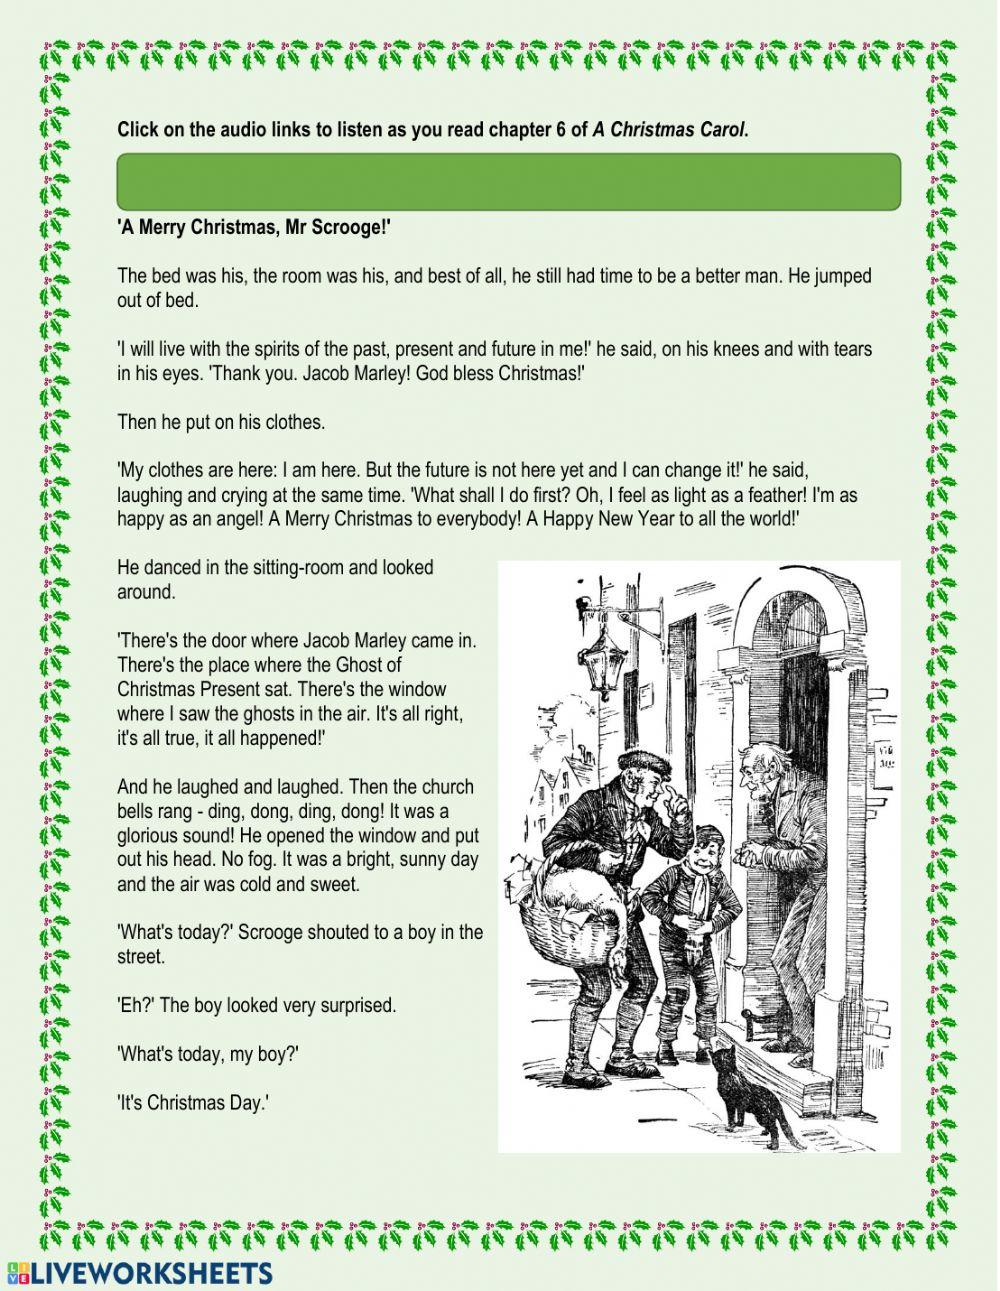 A Christmas Carol - Chapter 6 Worksheet